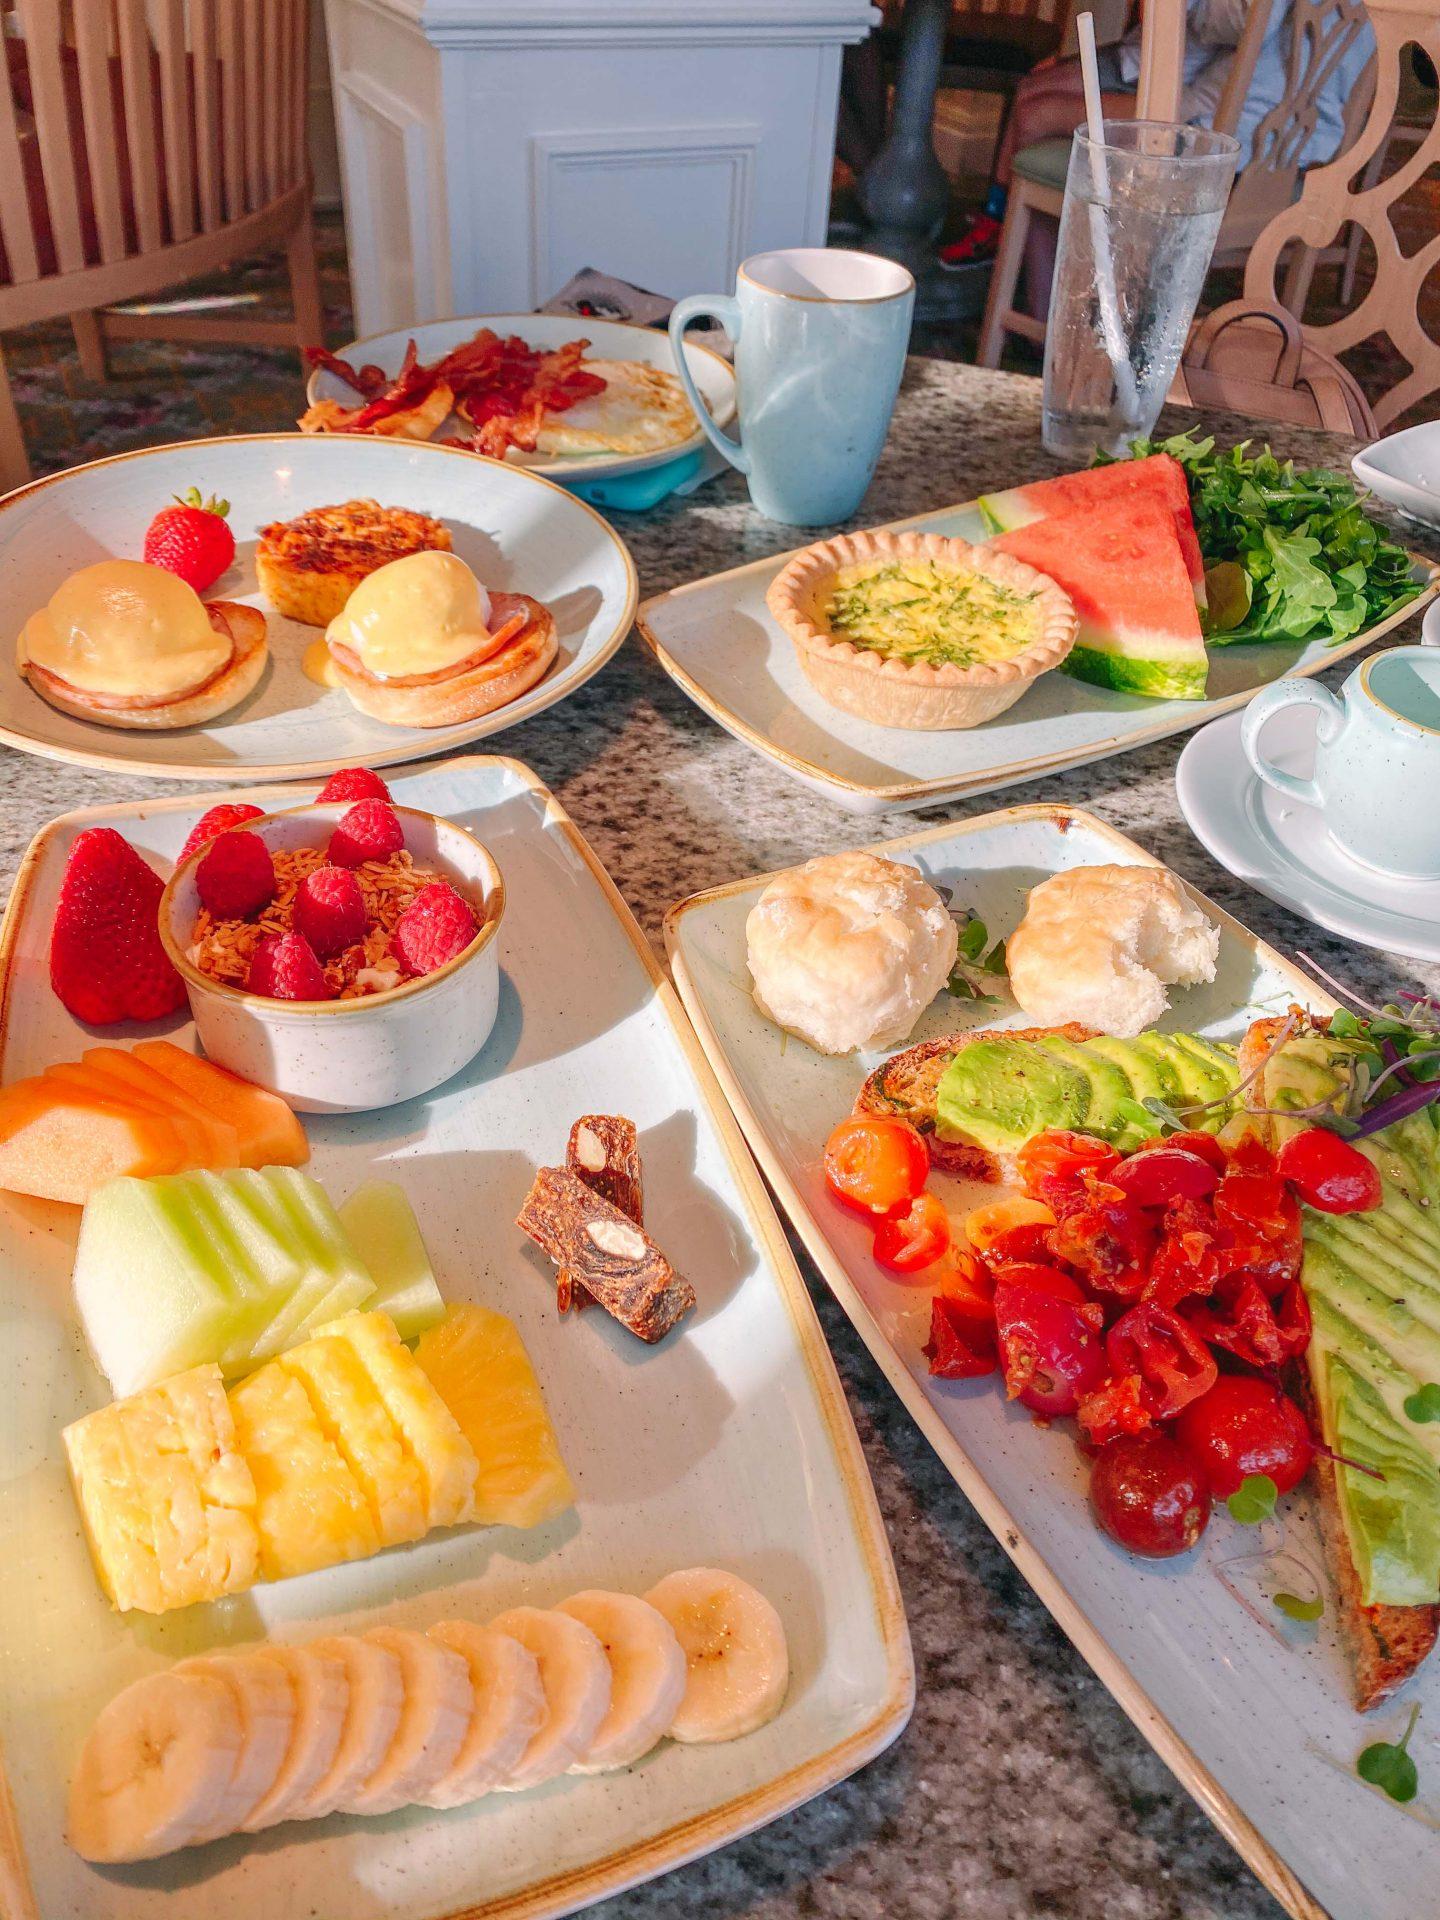 grand Floridian, walt disney world resorts, best resort disney, walt disney world planning, brunch walt disney world, coffee, healthy breakfast walt disney world, grand Floridian cafe,